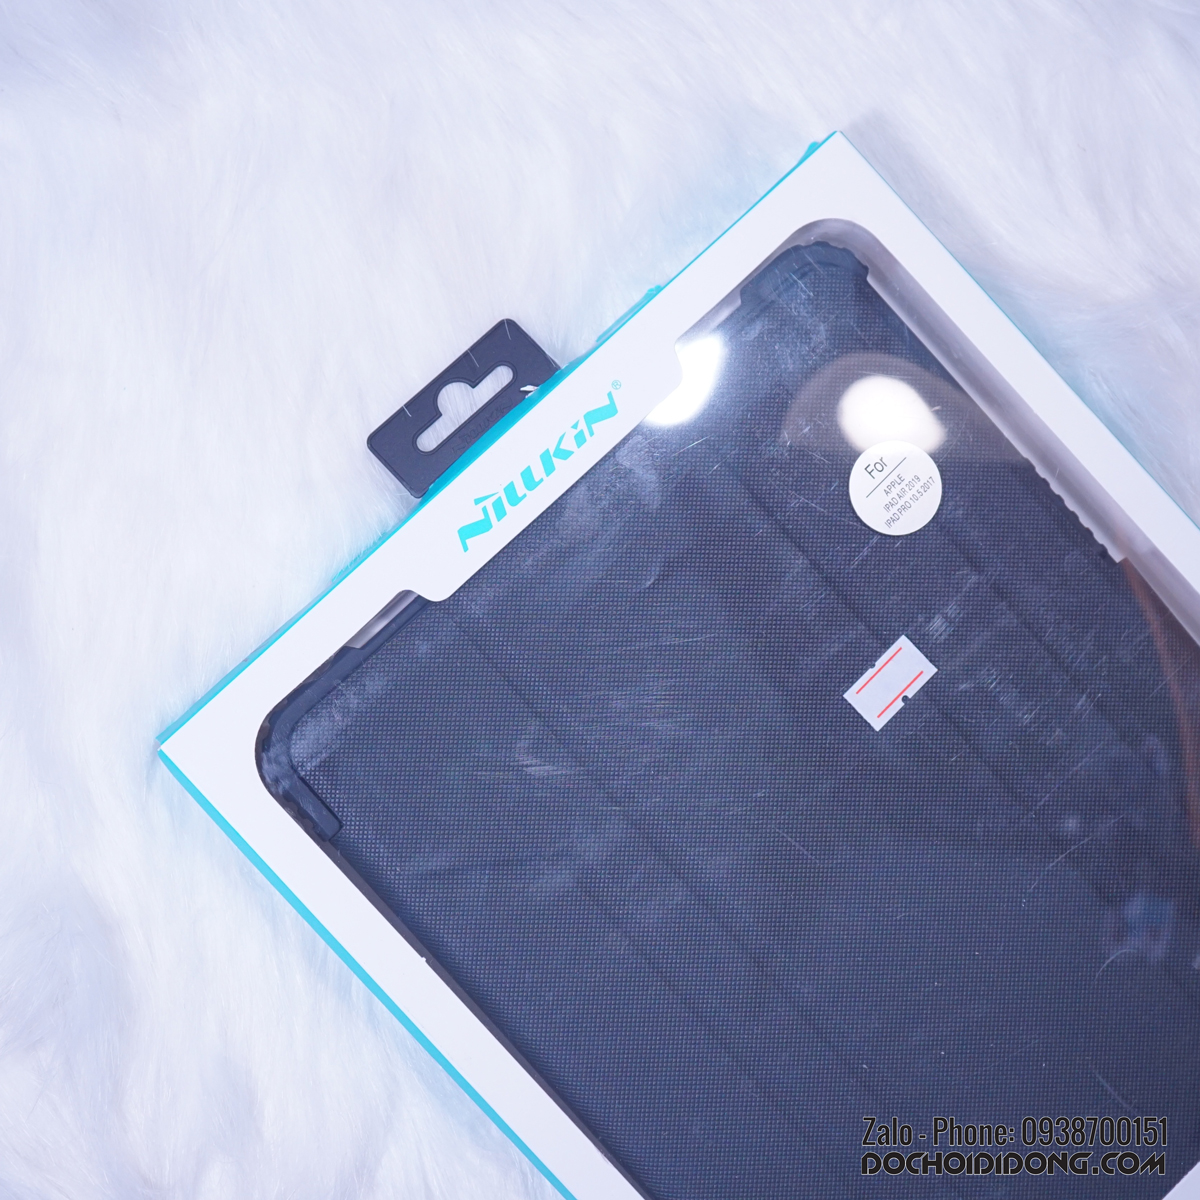 Bao da iPad Pro 10.5 Air 3 Nillkin chống sốc lưng trong